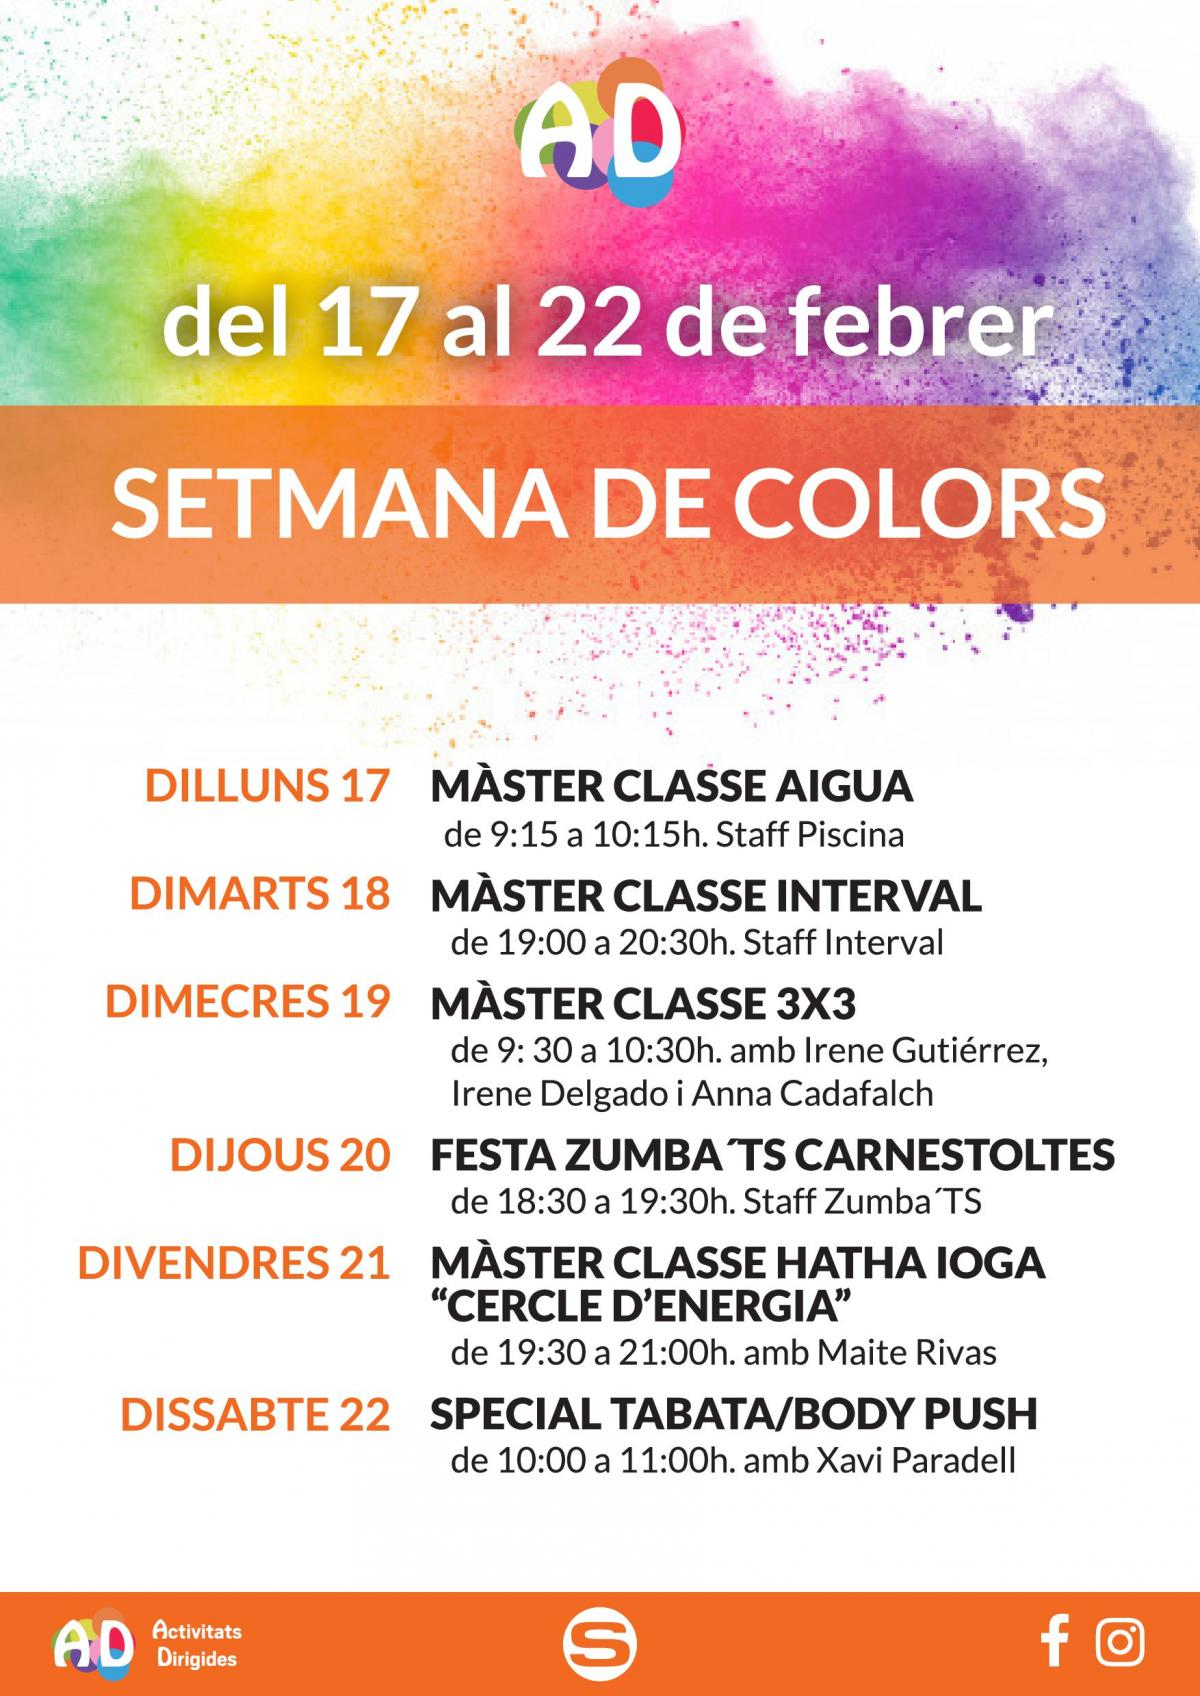 Semana de colores